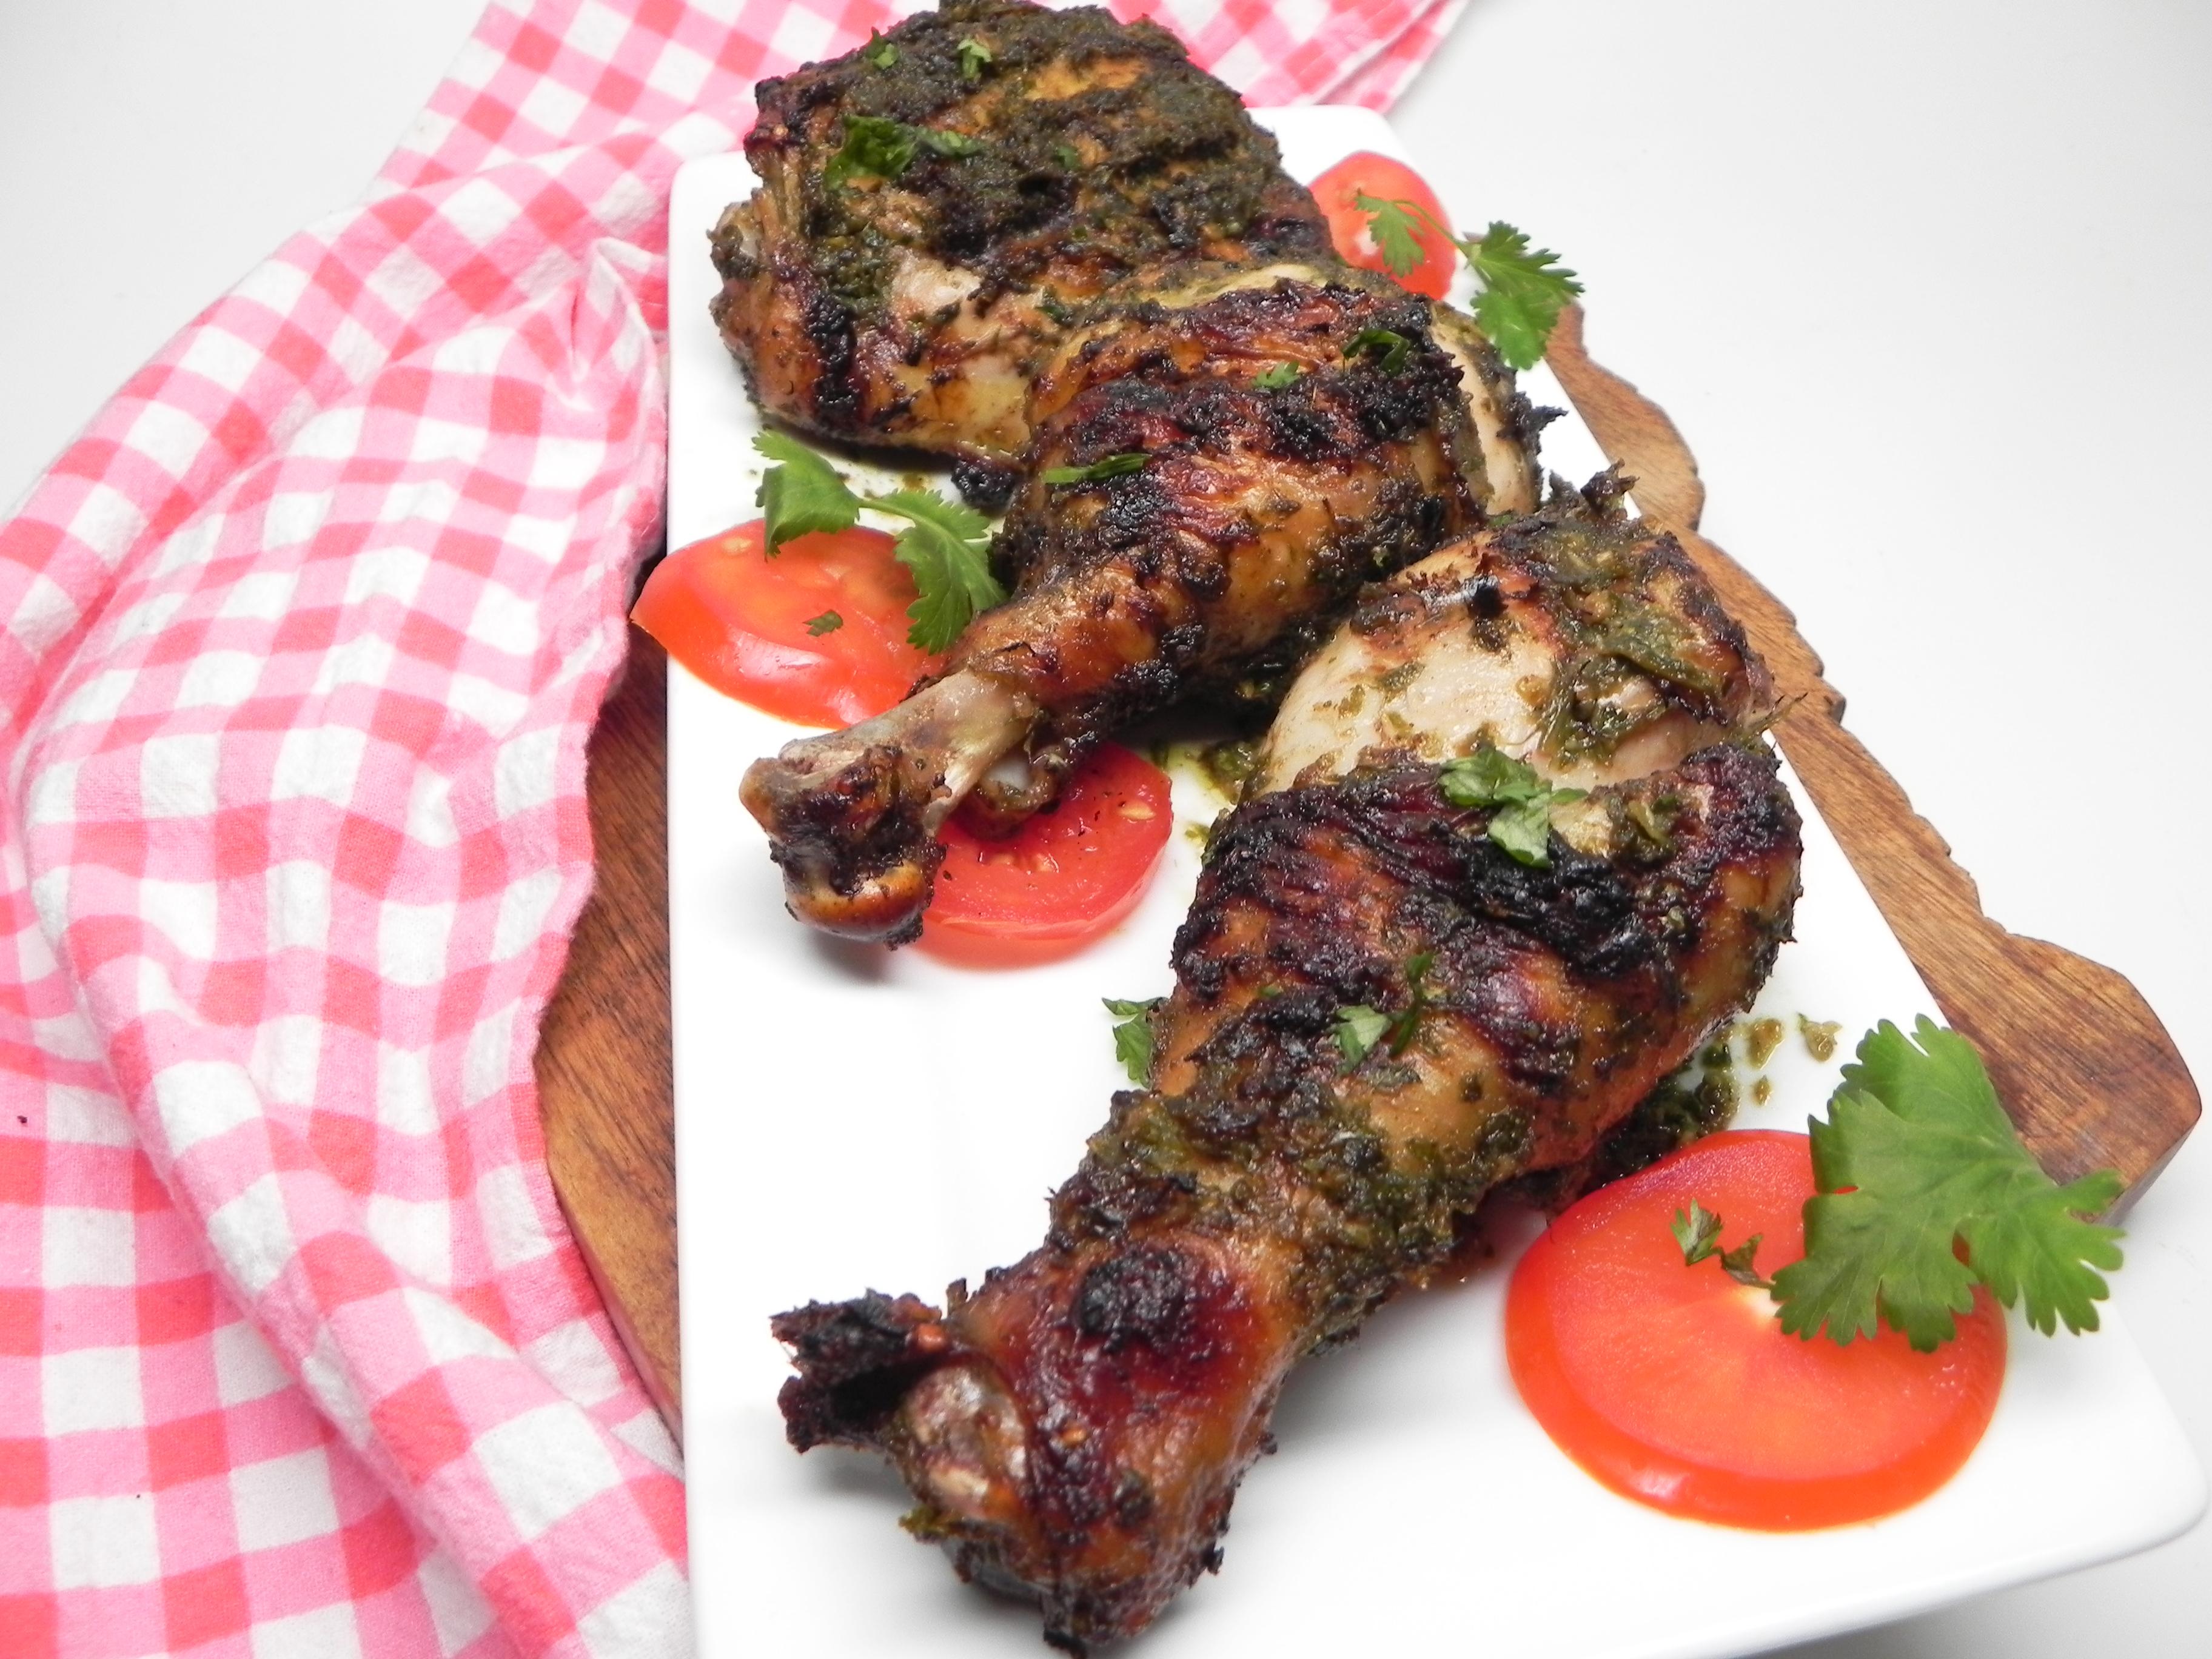 Jalapeno-Cilantro Grilled Chicken